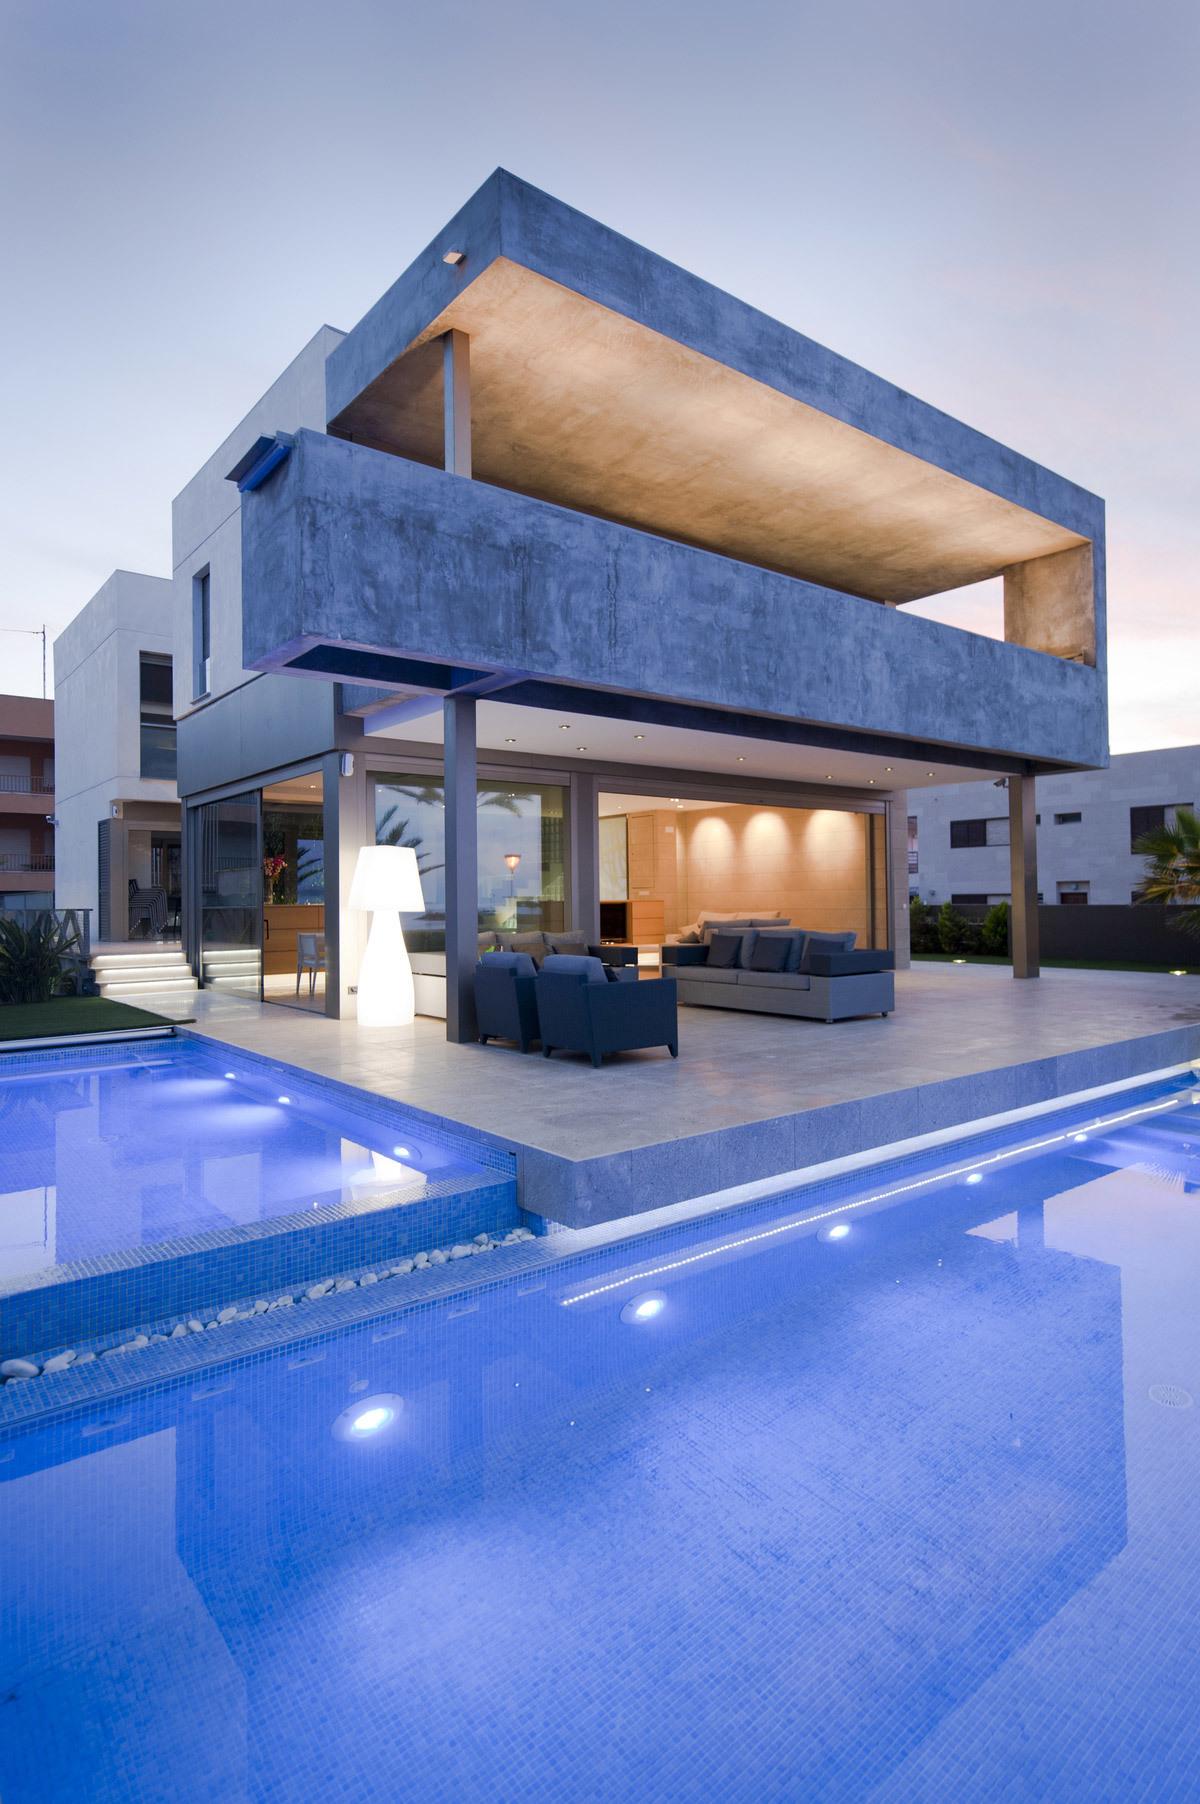 Residence on the Mediterranean Coast by Manuel Herrera Ros estudio MUHER